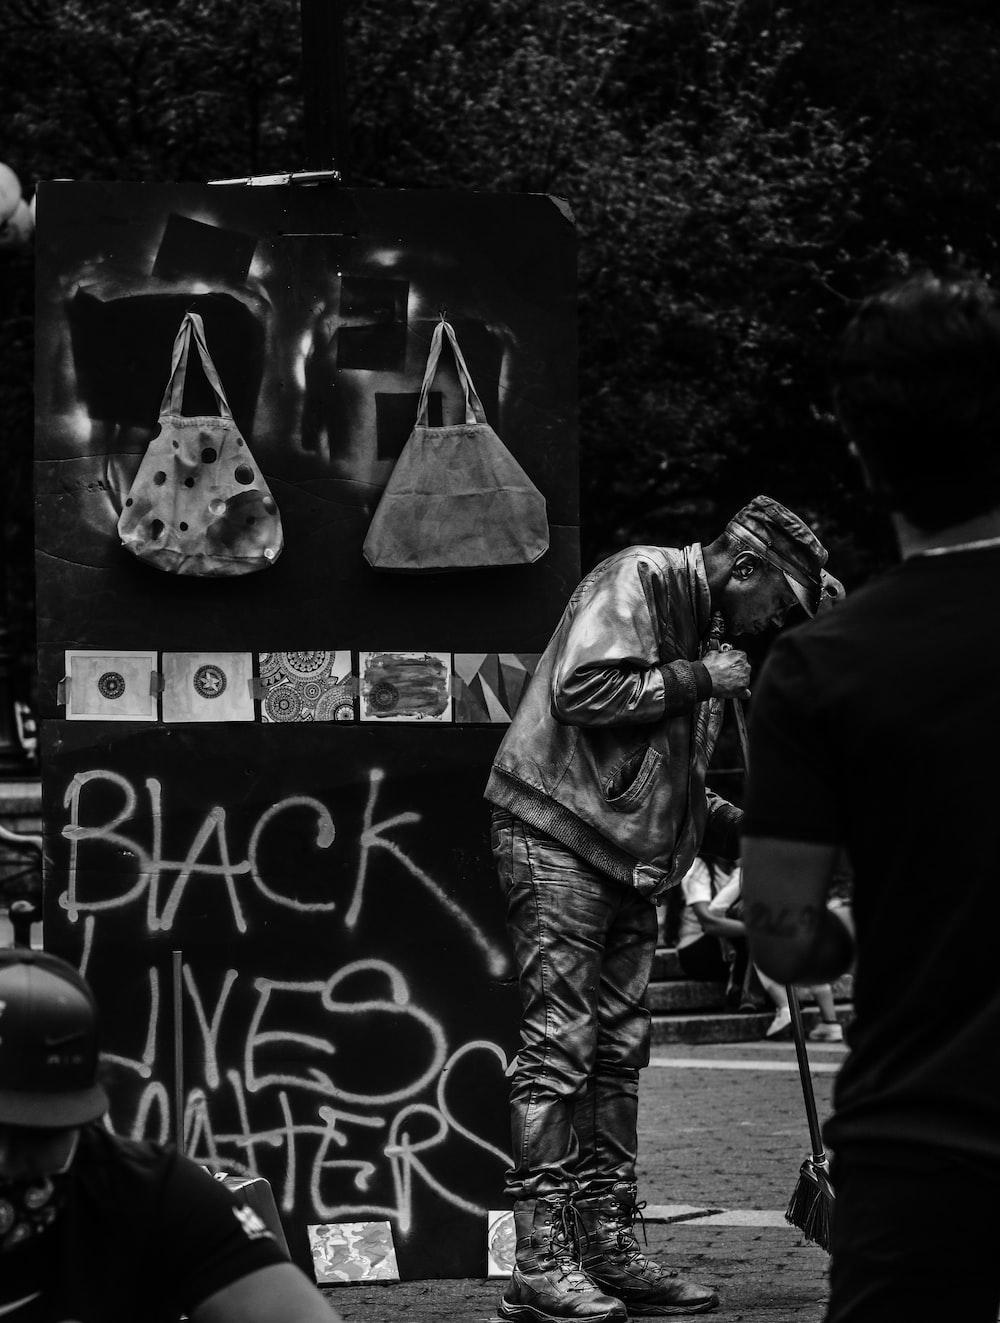 man in black jacket and black pants standing near man in black jacket